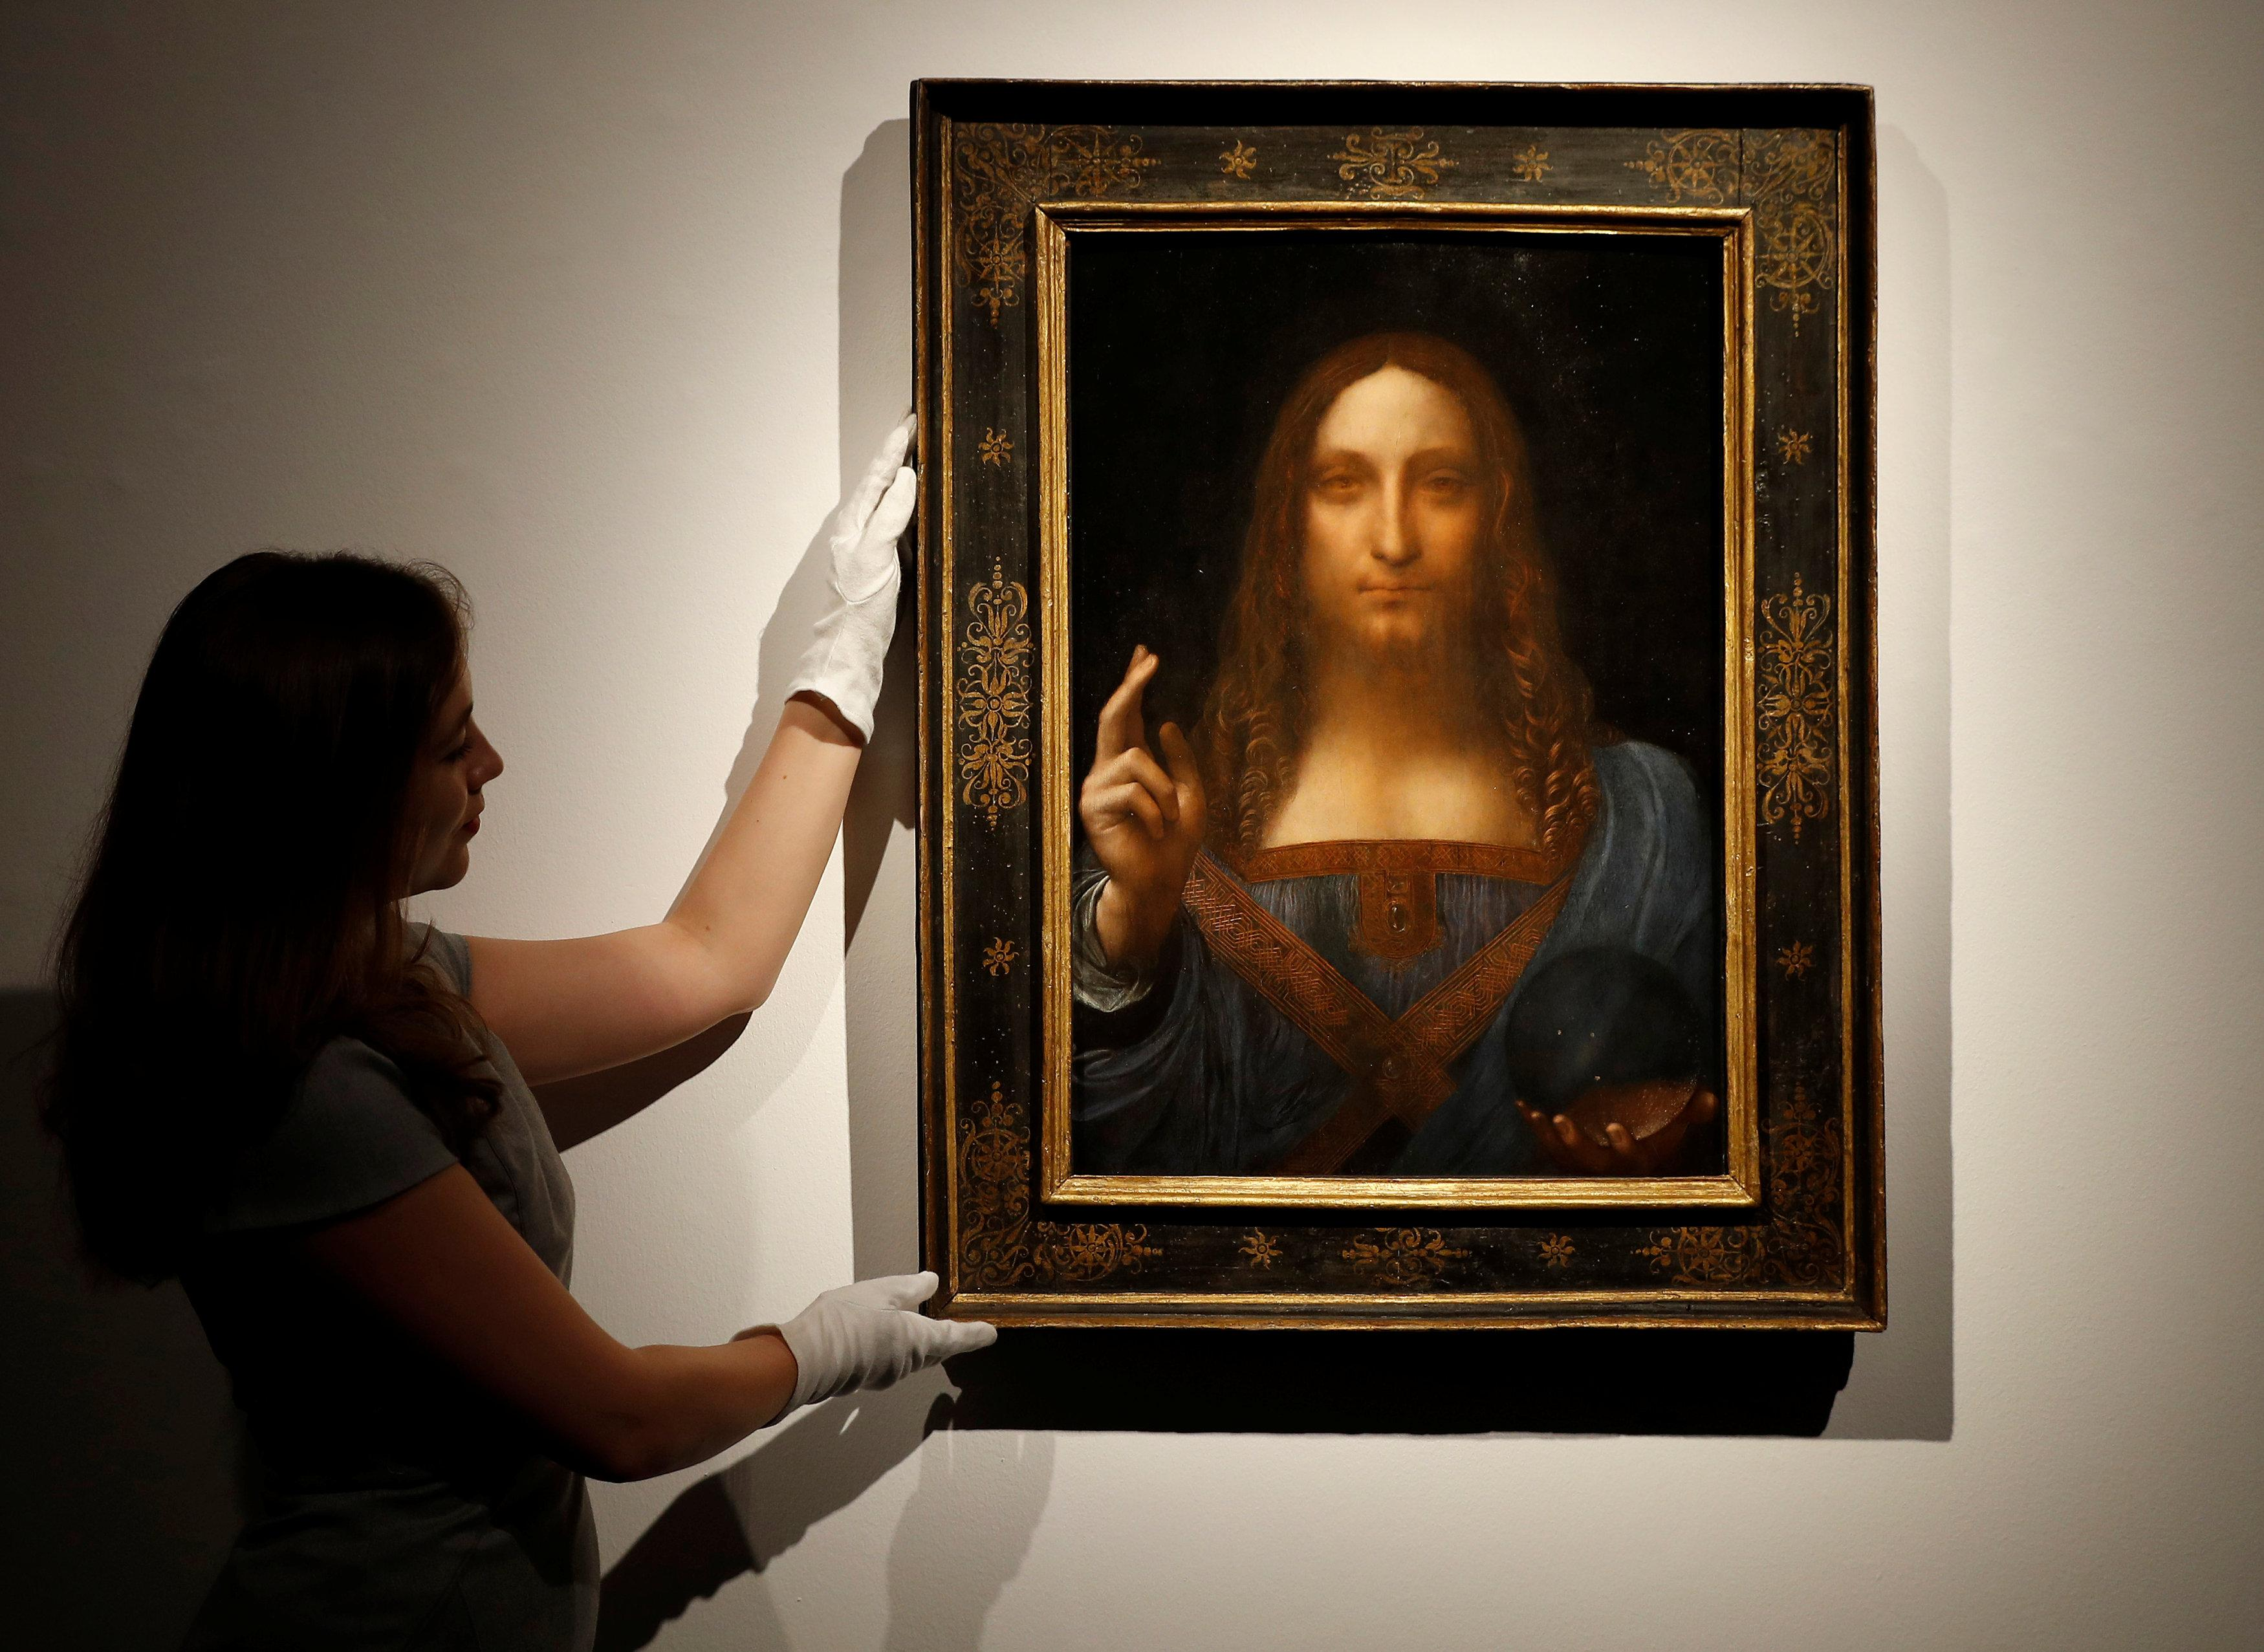 Mở cửa triển lãm Leonardo Da Vinci tại bảo tàng Louvre